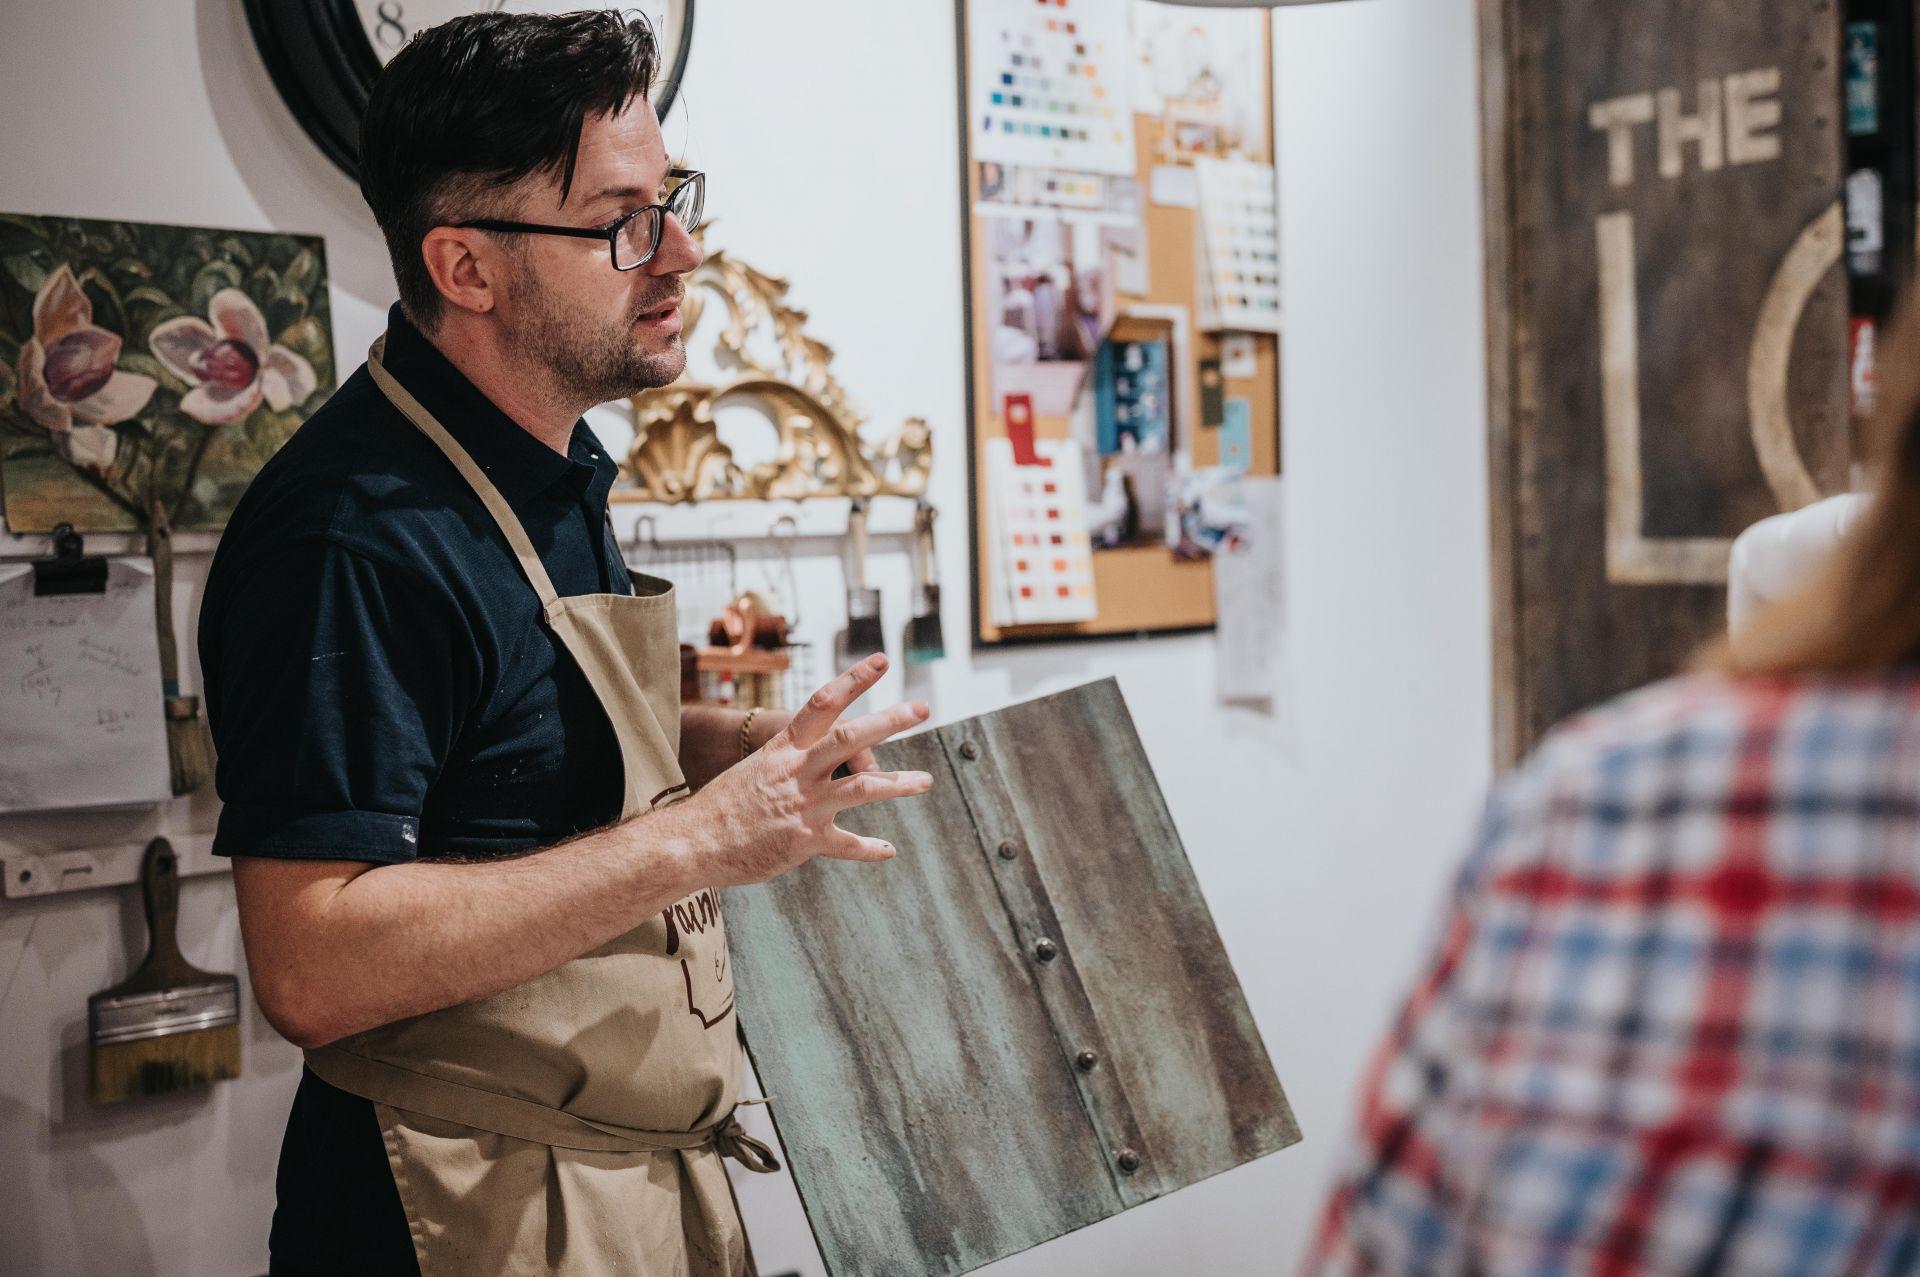 jonathon marc mendes teaching at The Loft